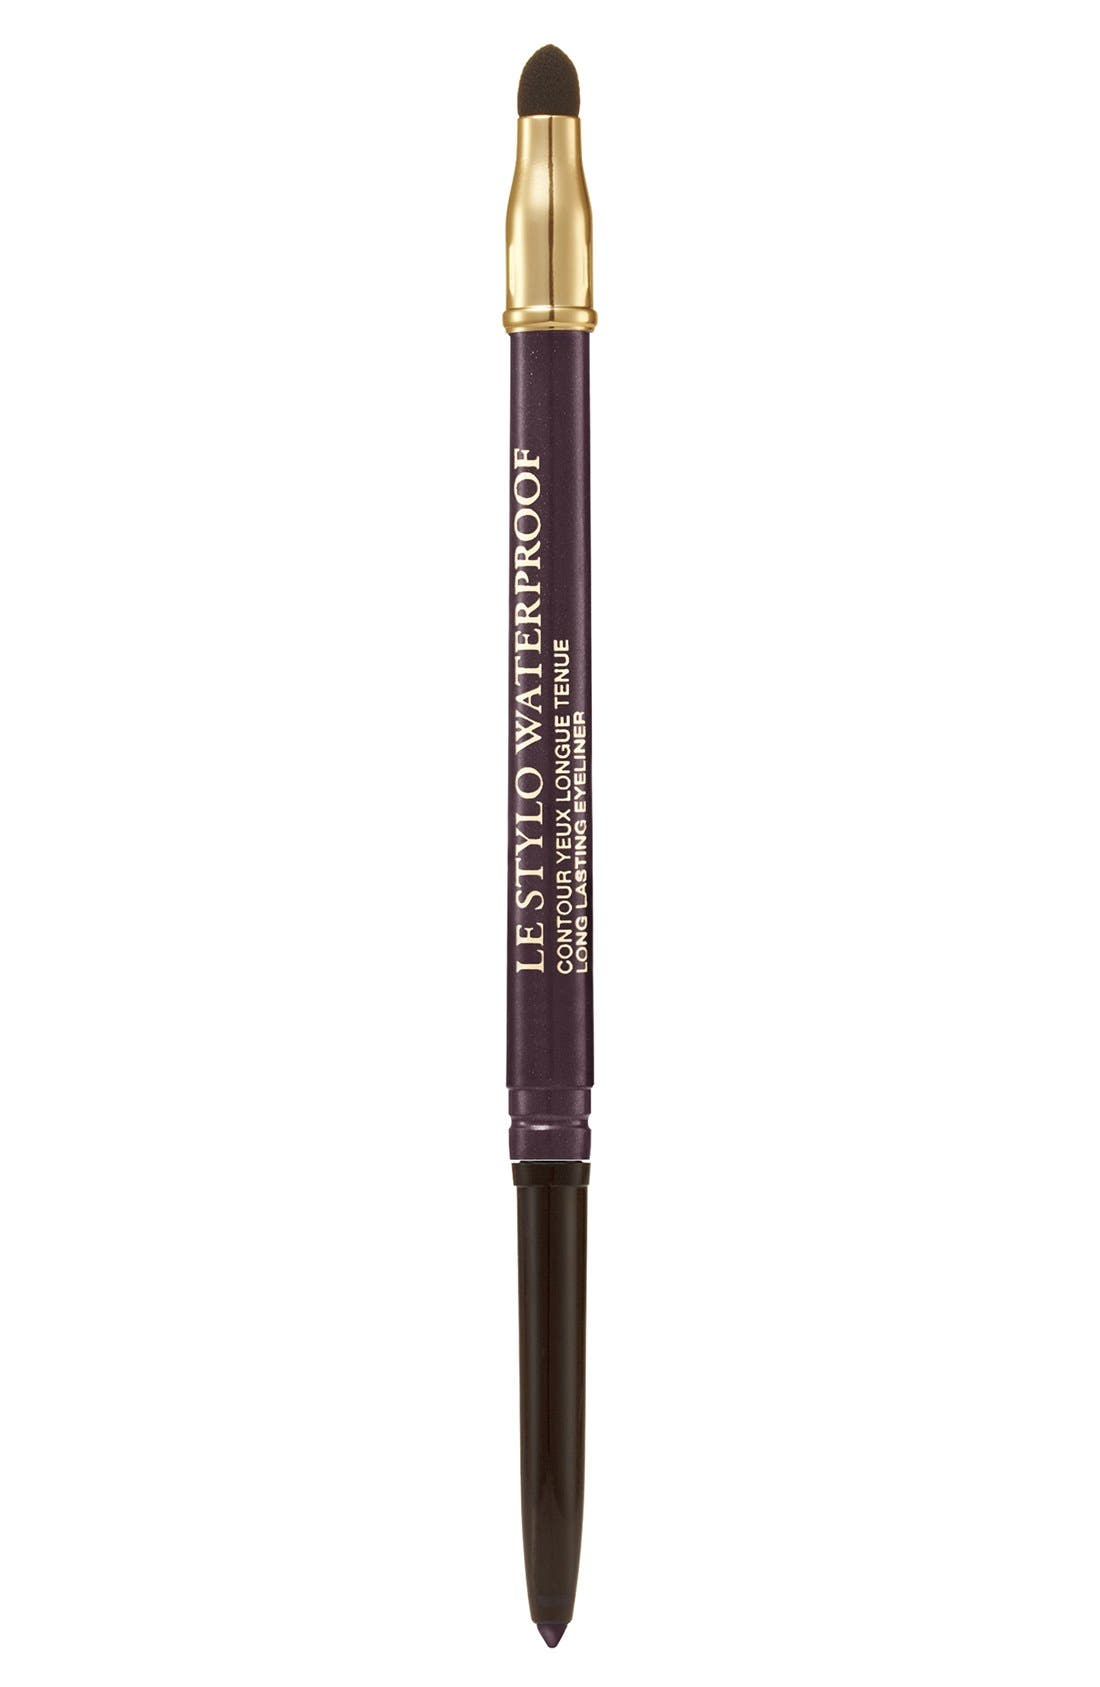 Lancome Le Stylo Waterproof Long Lasting Eyeliner - L